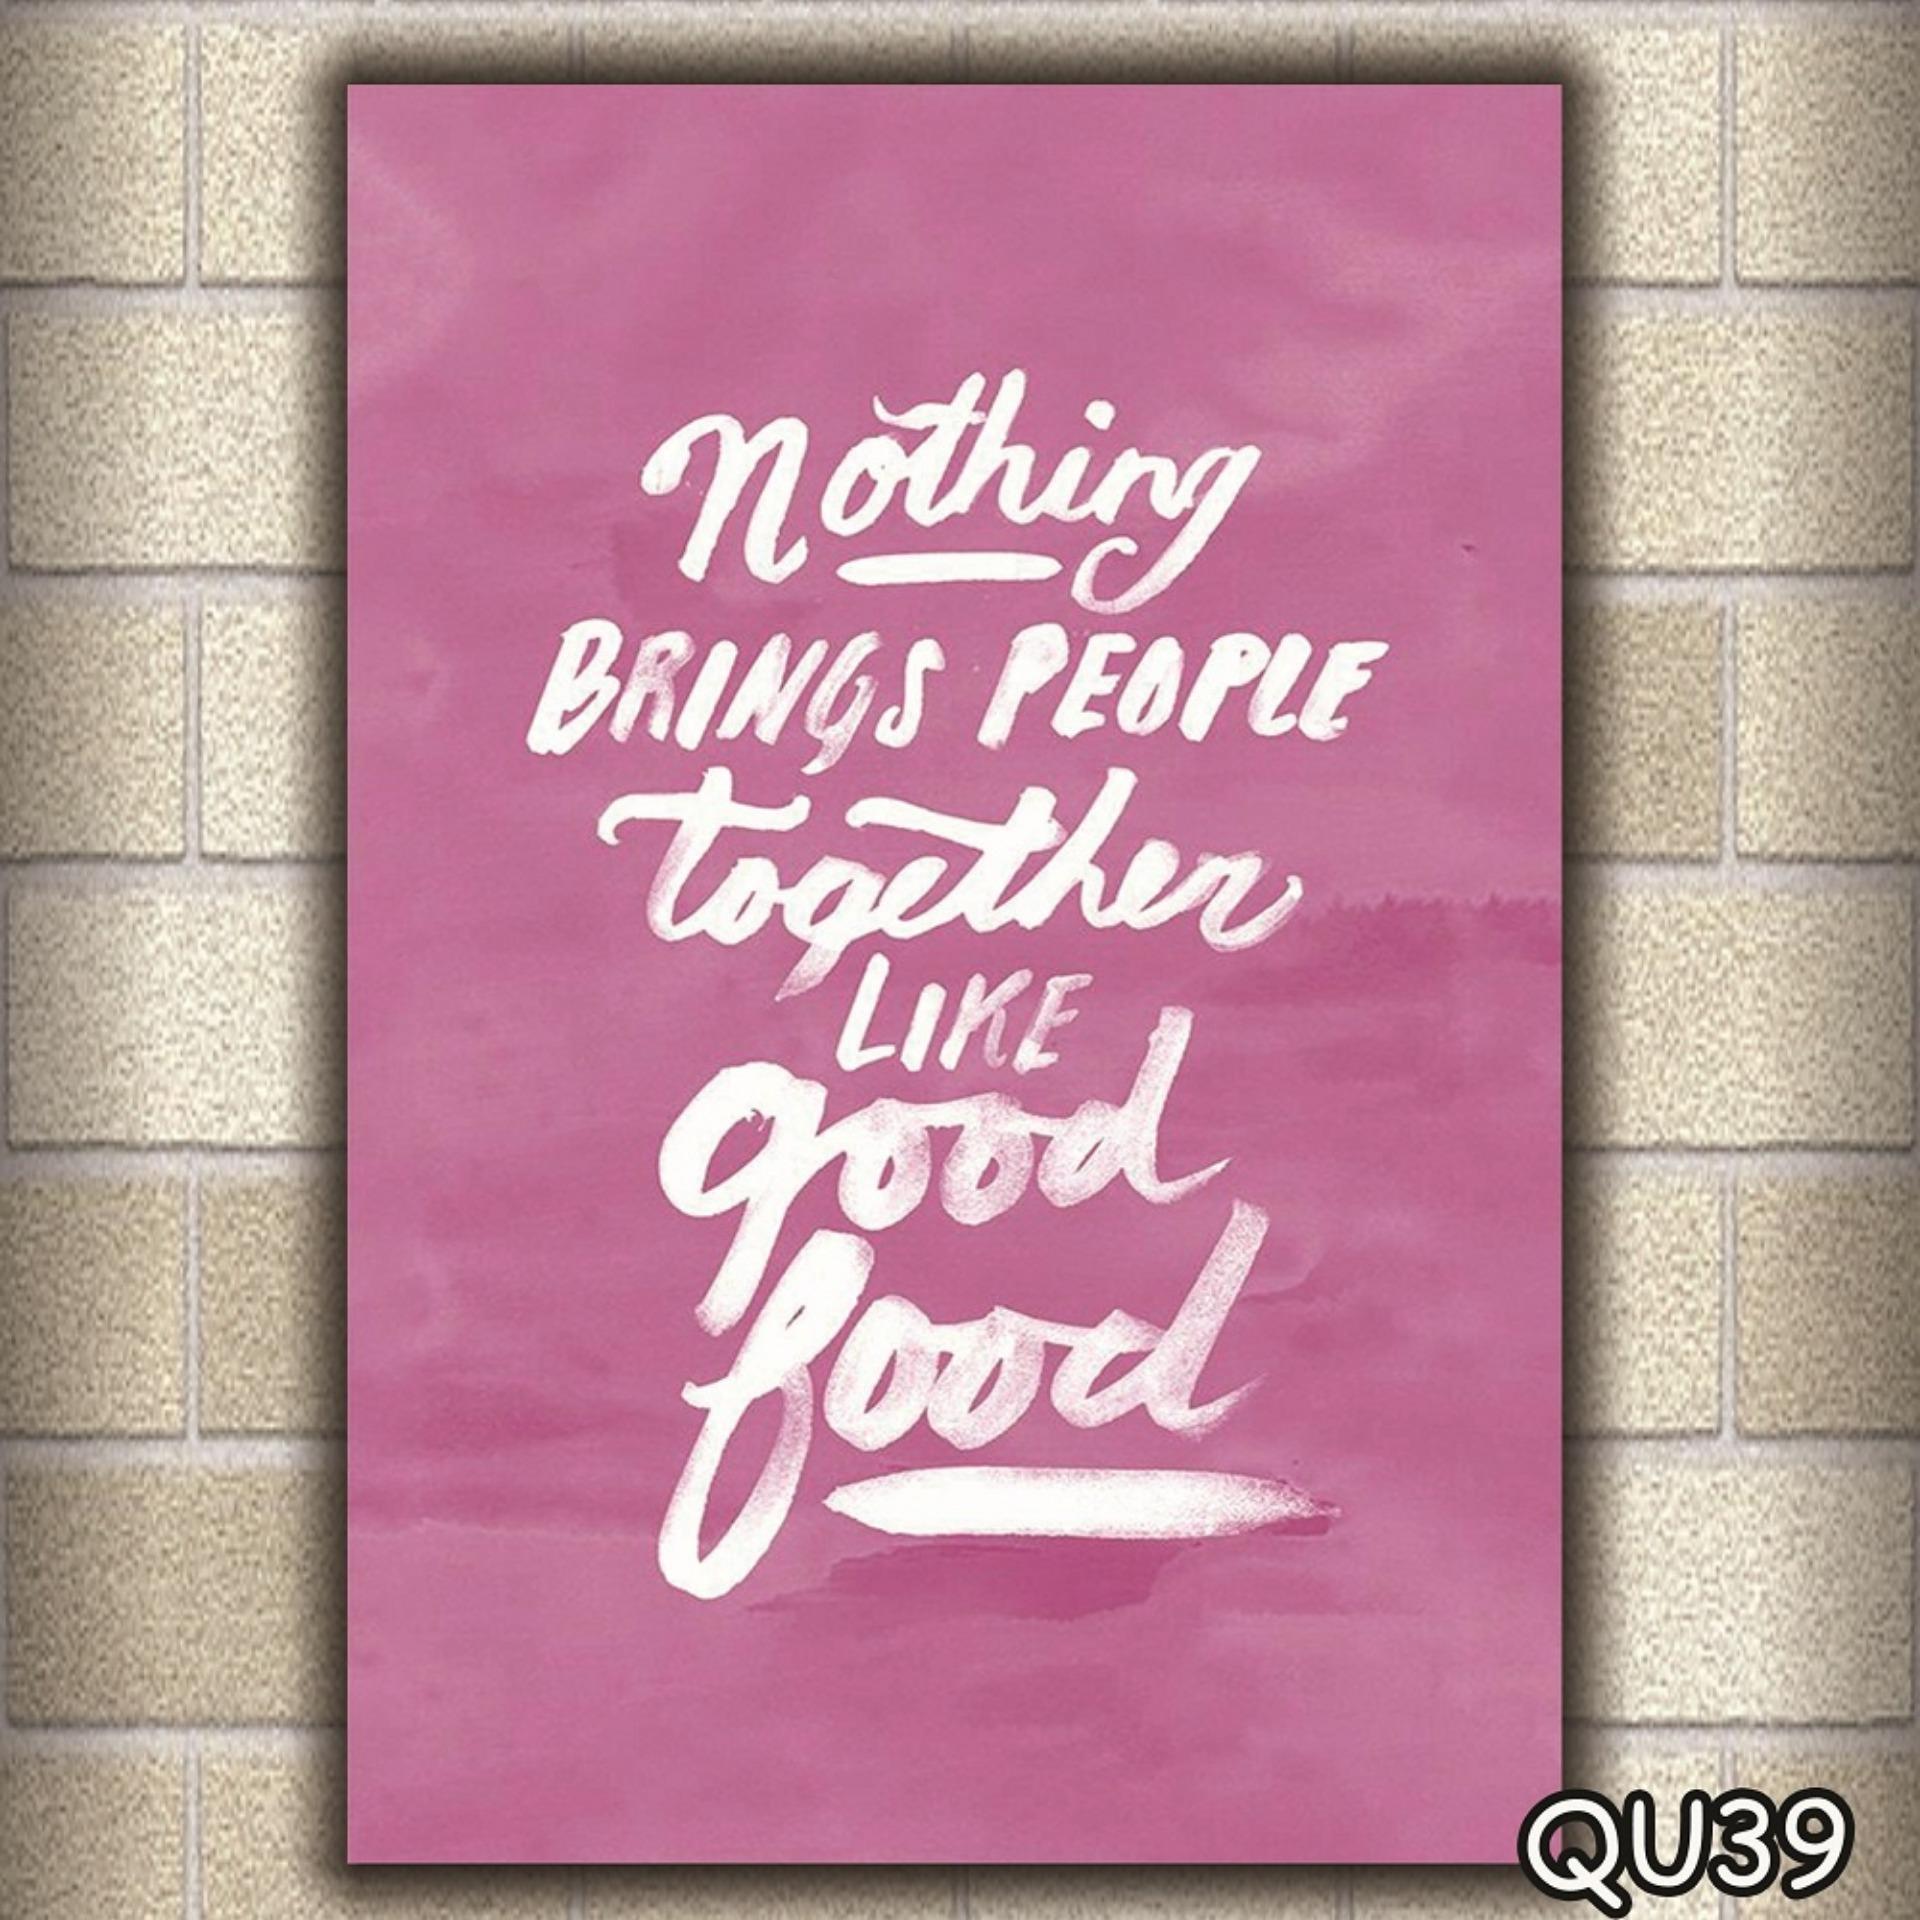 Vasty Hiasan Dinding Kayu Wall Decor Poster Super Quotes VSQ-39